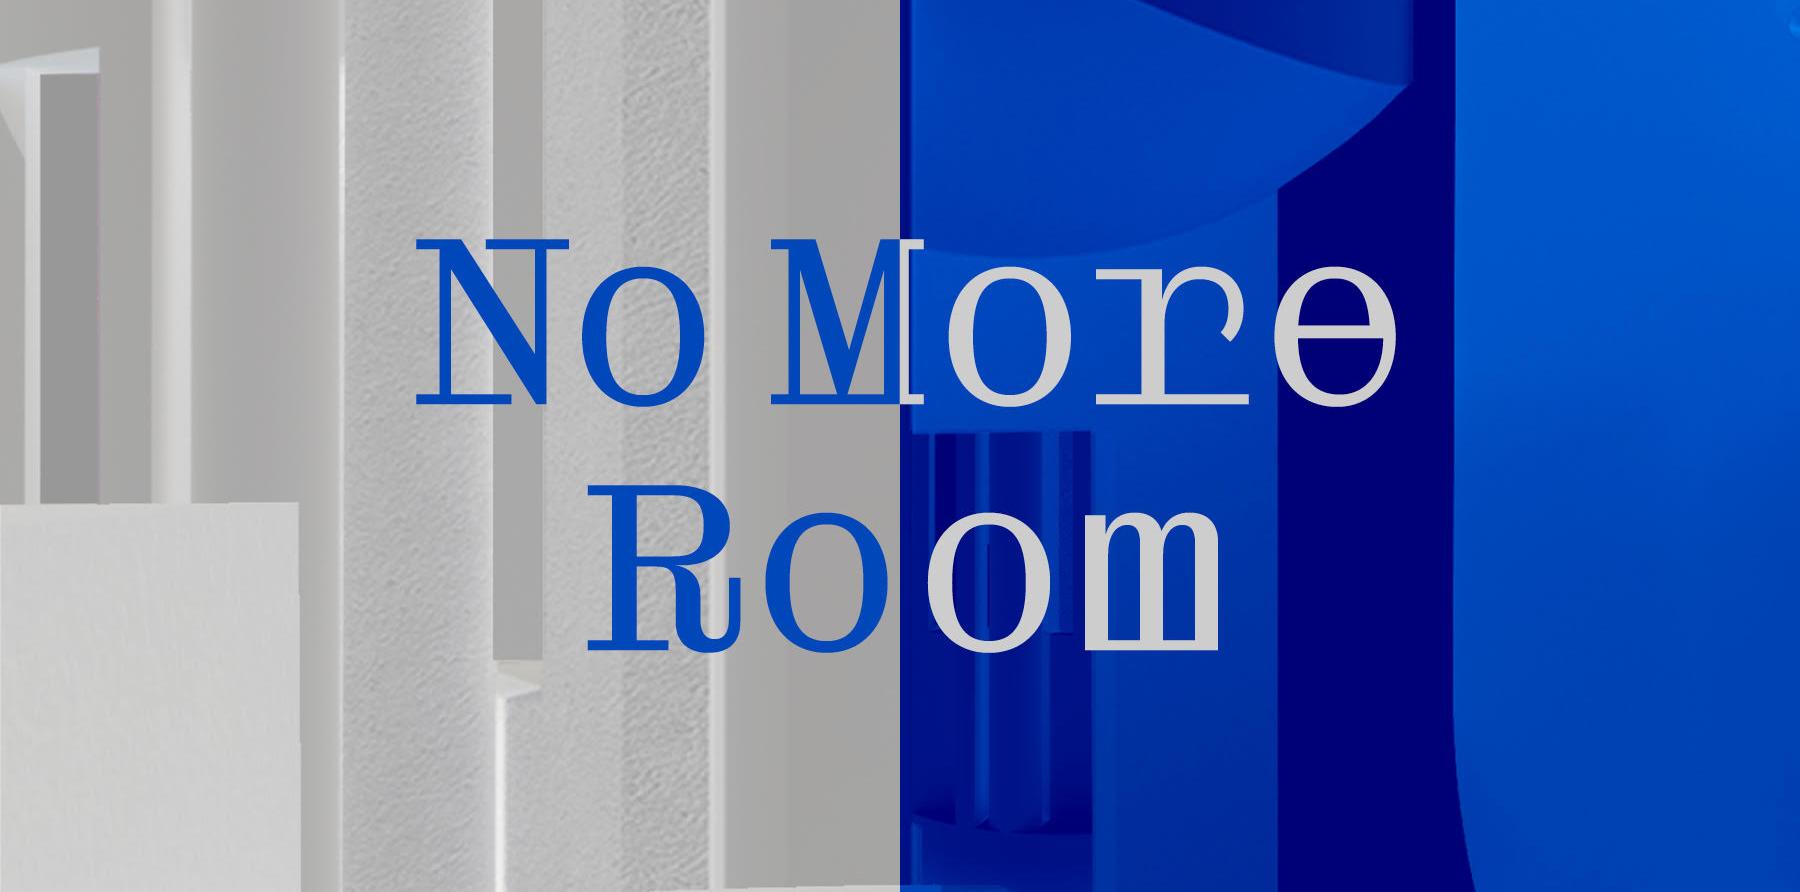 BairBalliet, No More Room exhibition title image, 2021